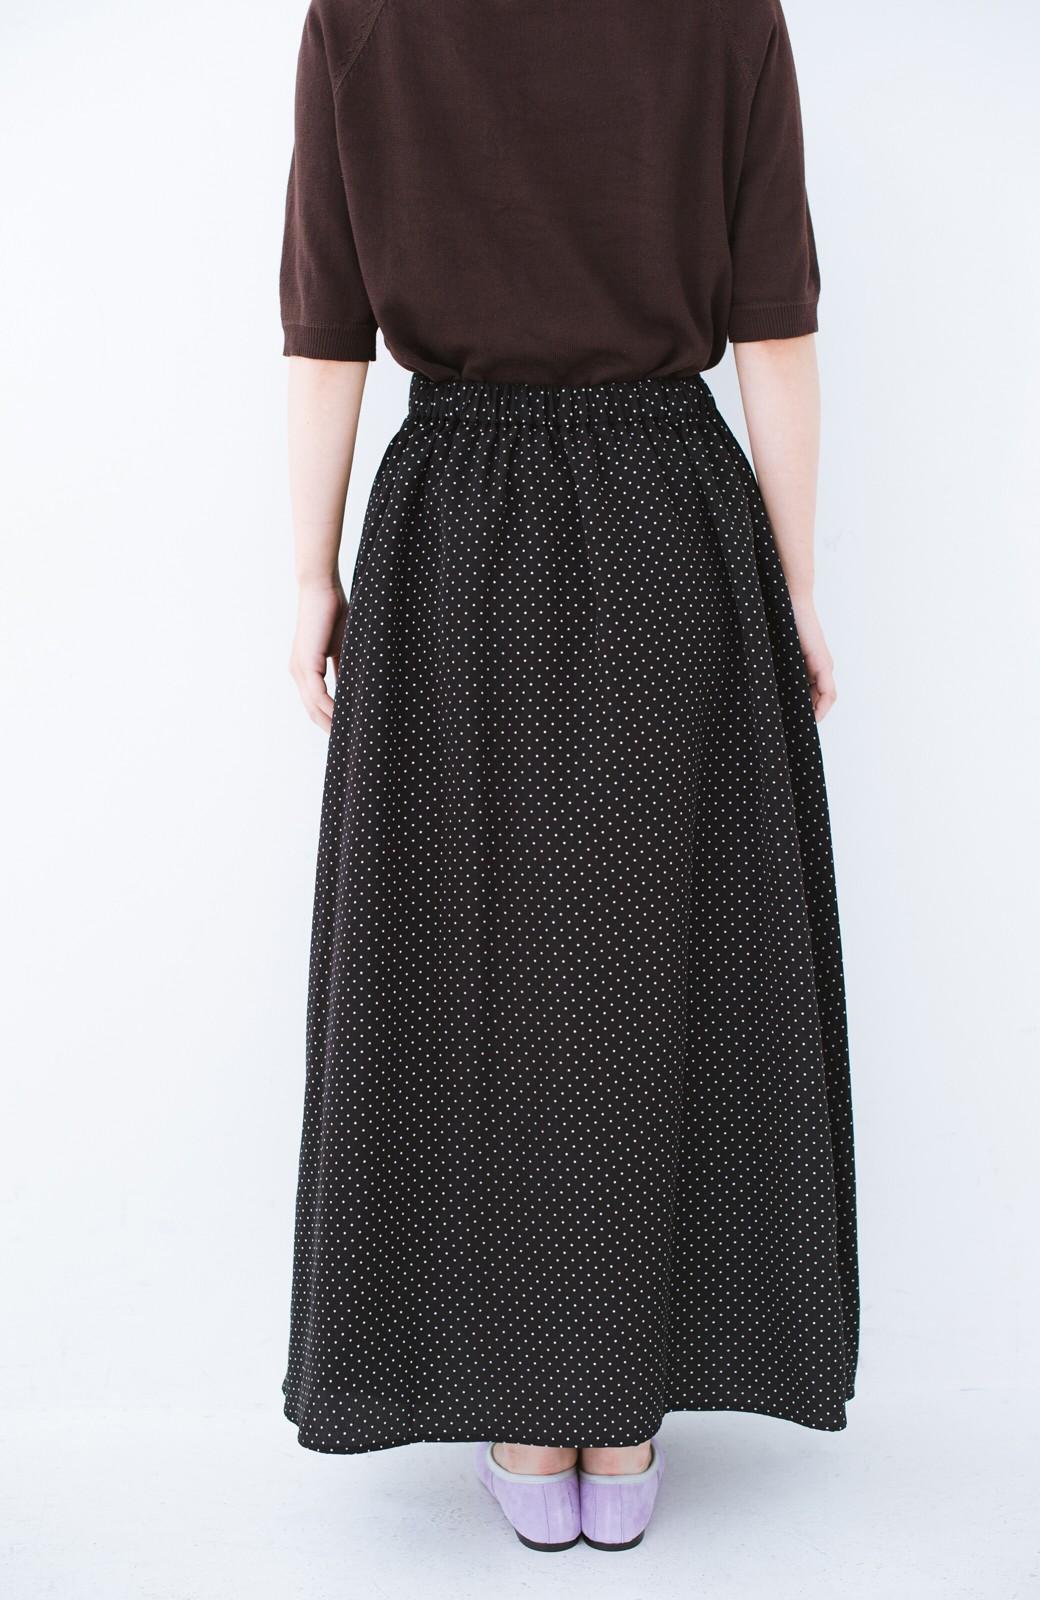 haco! ずっと着られる大人のドットロングスカート by que made me <ブラック系その他>の商品写真3